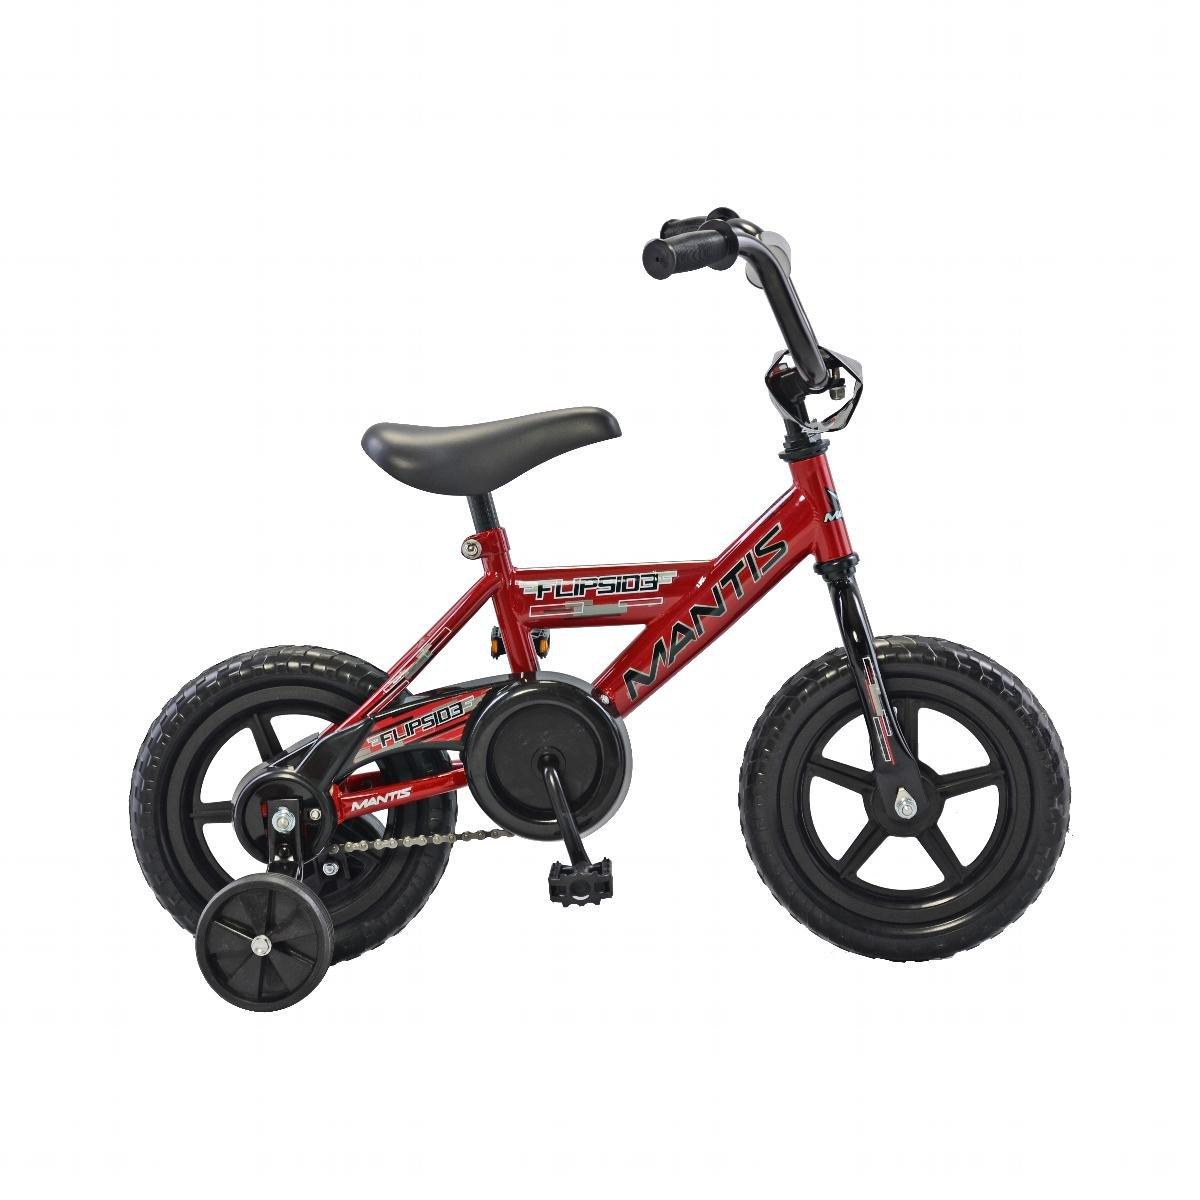 Mantis Flipside 12子供用自転車 B072FHPG66レッド 12 inch